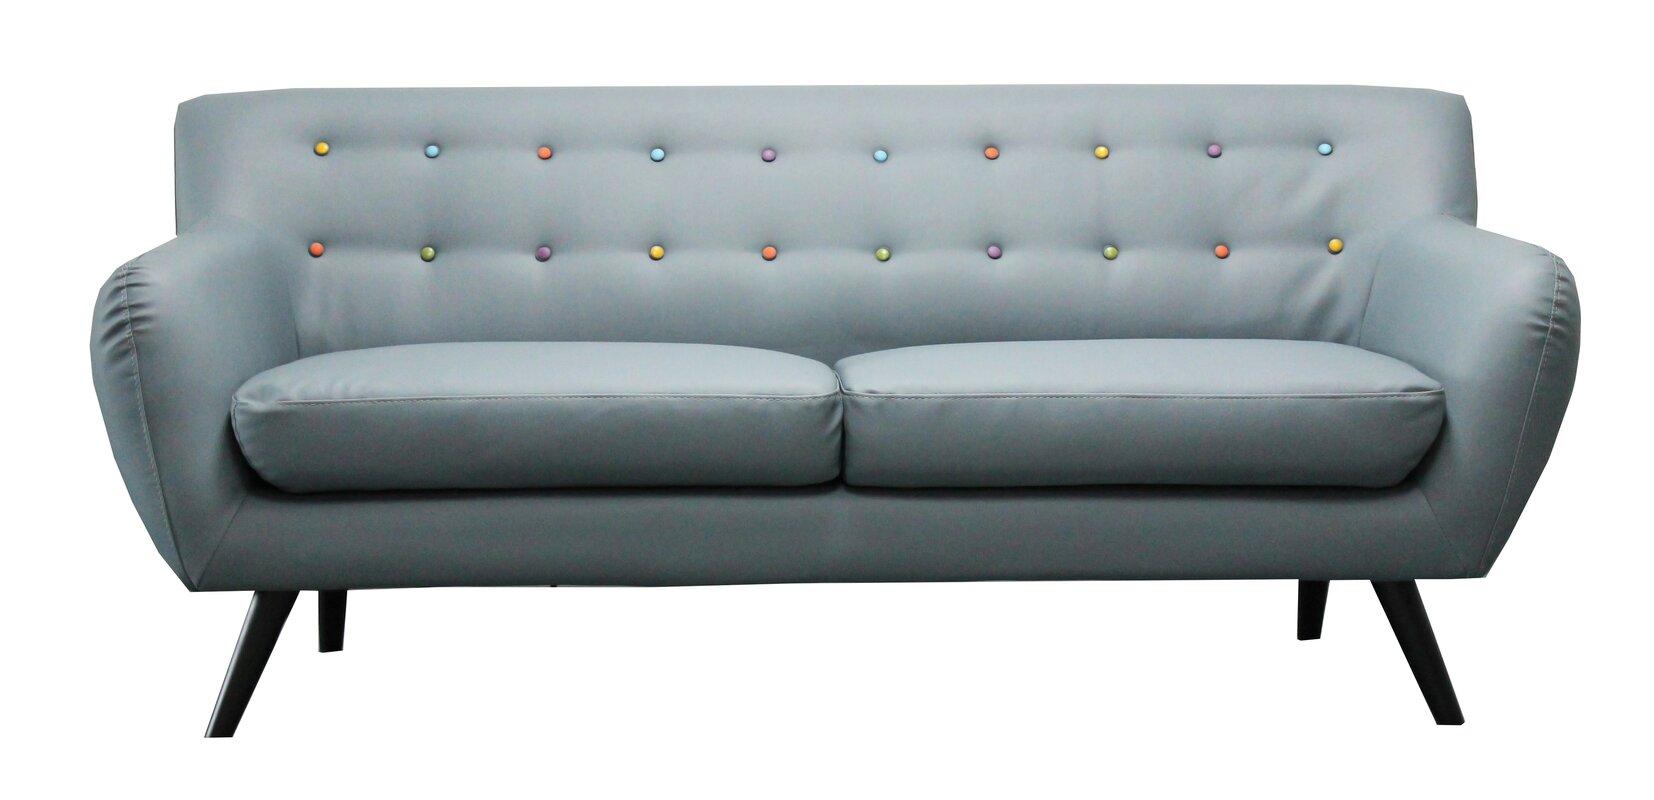 madison home usa mid century modern tufted sofa  reviews  wayfair - defaultname